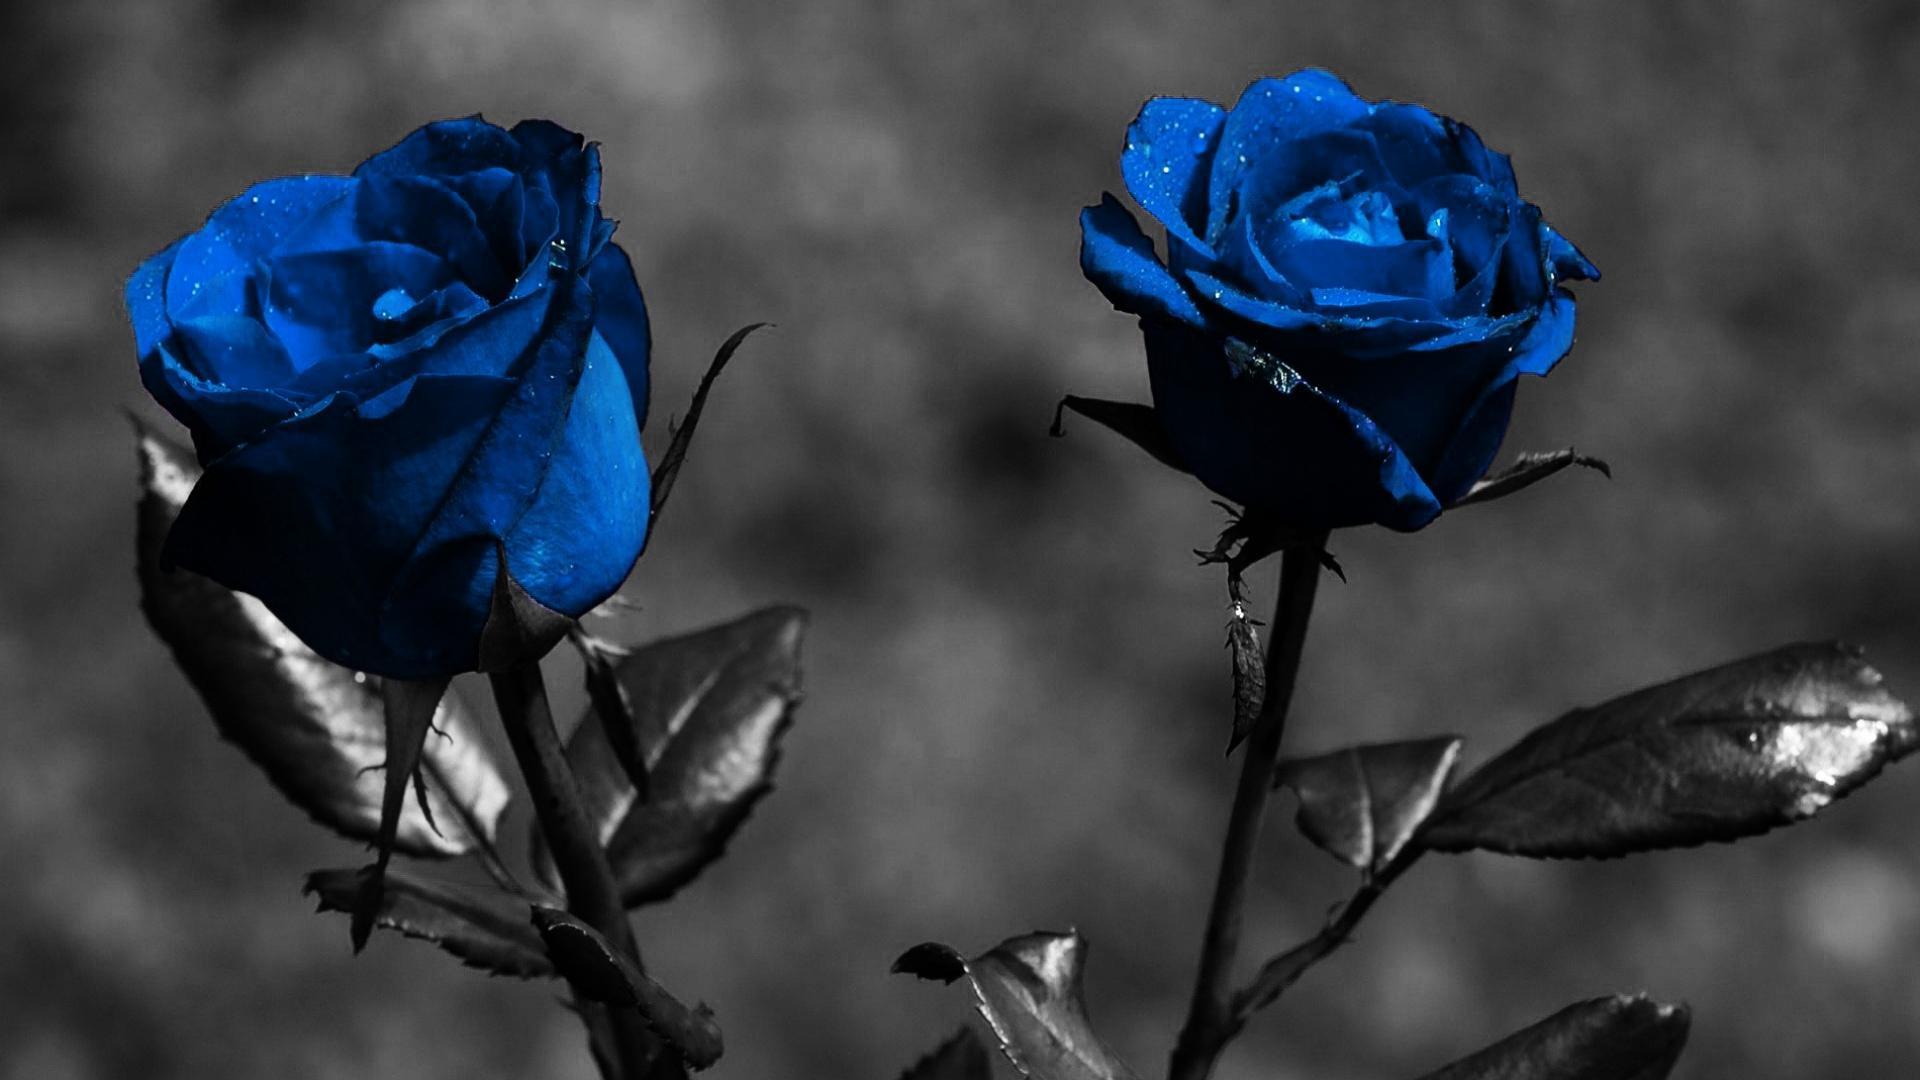 Blue Rose Flower Images 5 Cool Hd Wallpaper Hdflowerwallpaper Com